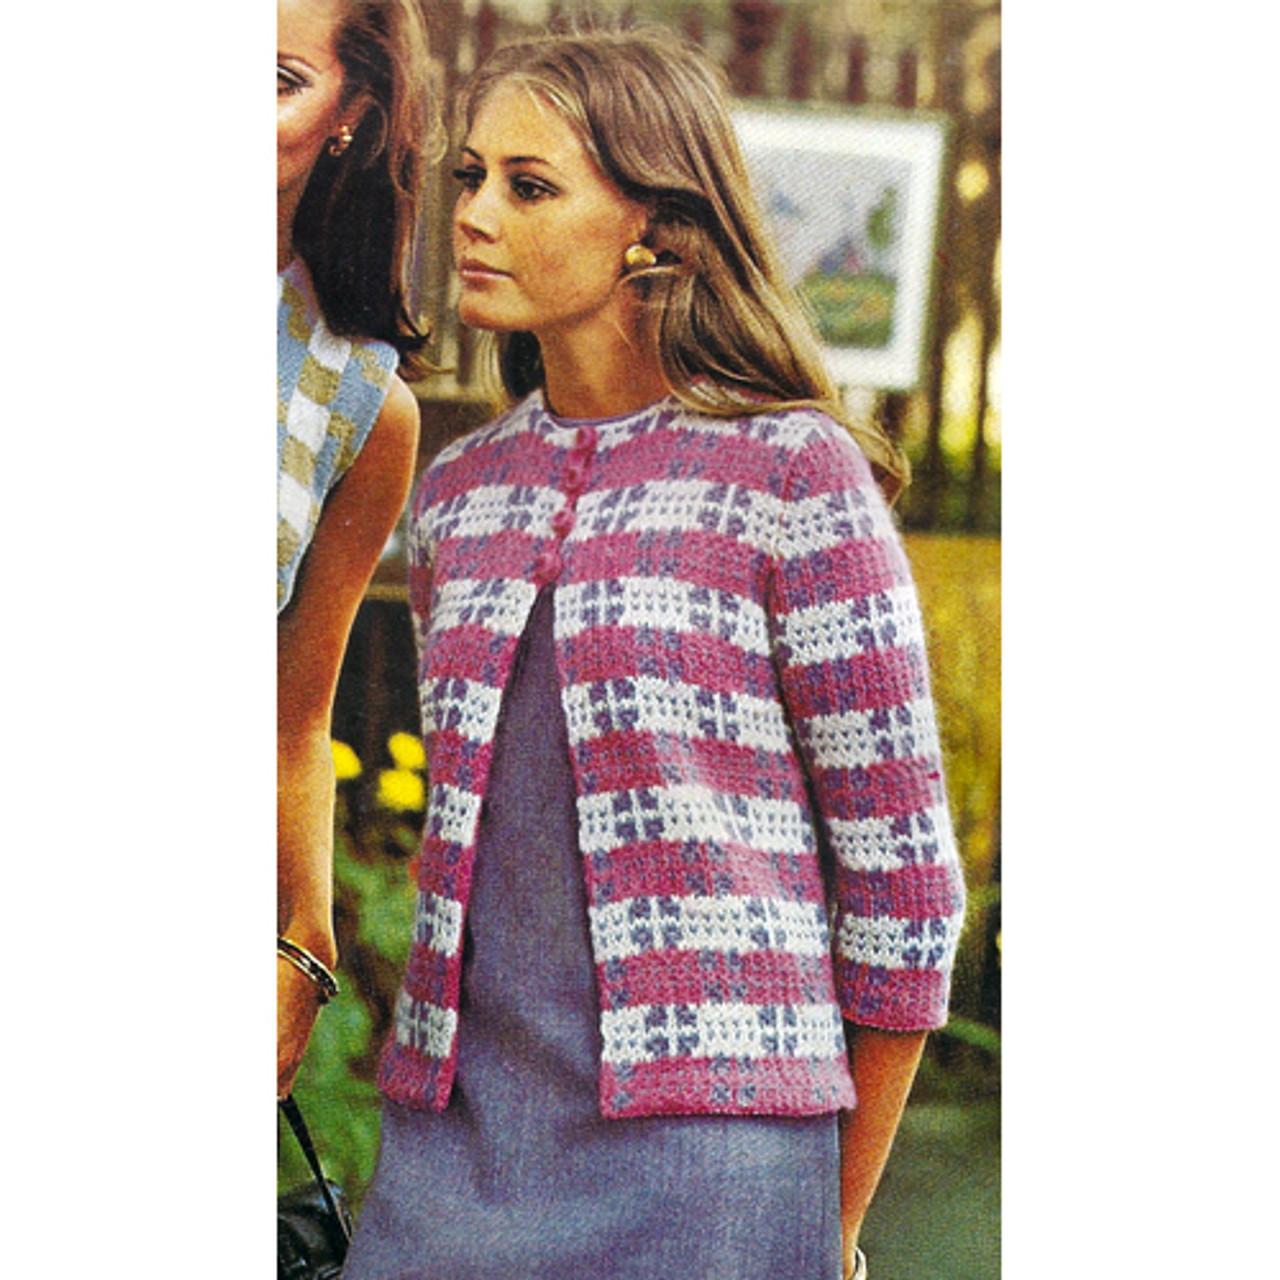 Vintage Plaid Jacket Knitting Pattern, Tri Color